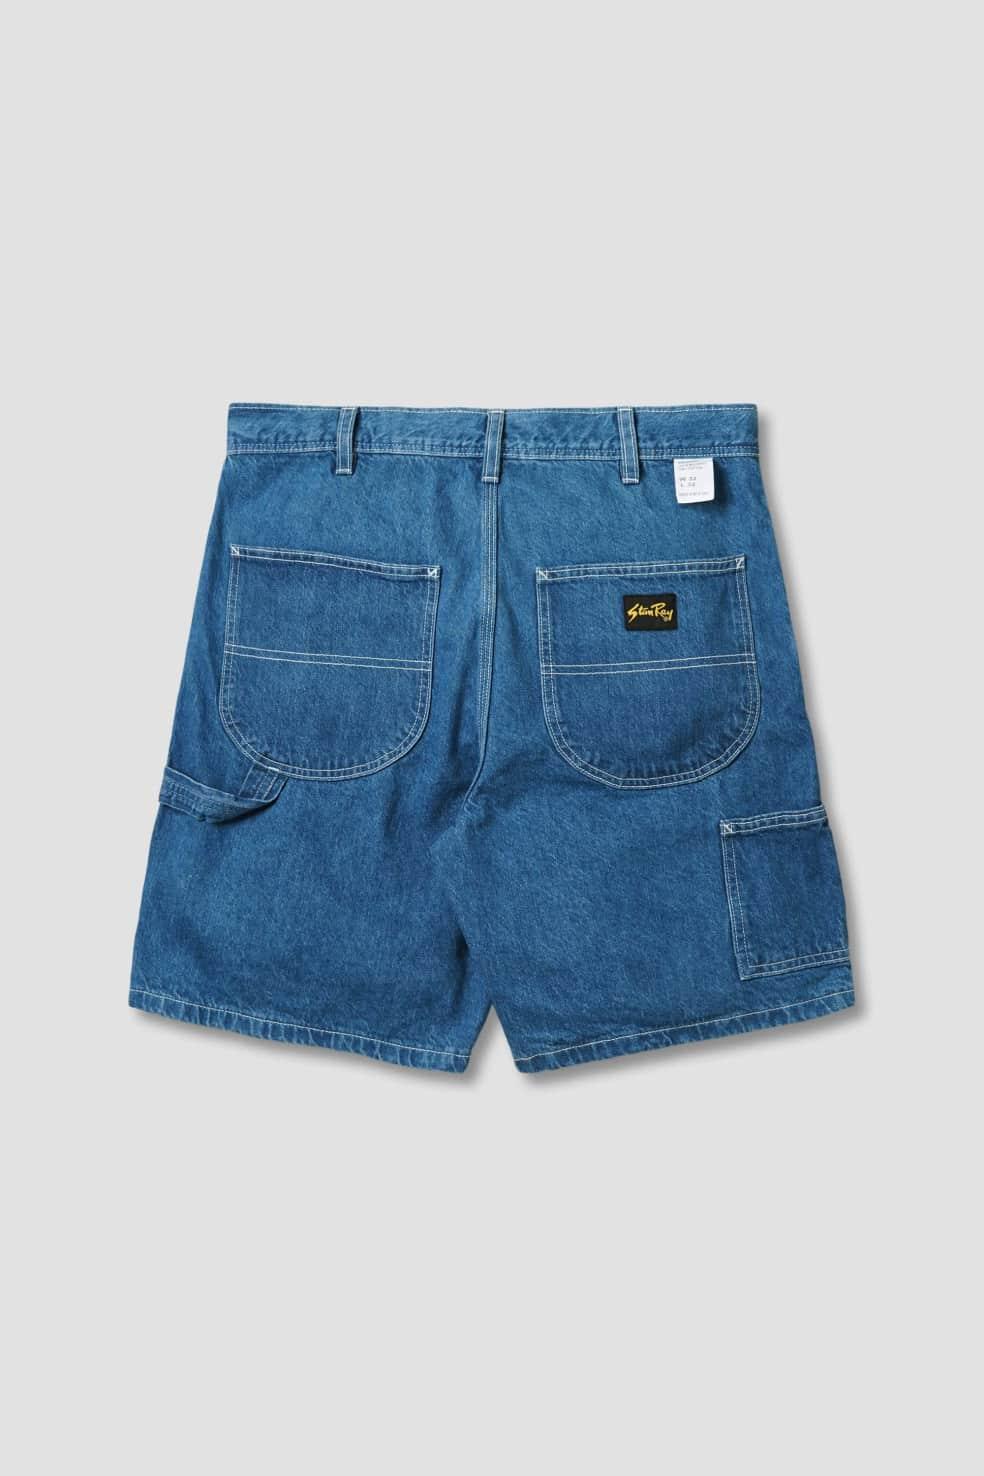 Stan Ray Painter Short - Light Stone Denim | Shorts by Stan Ray 3